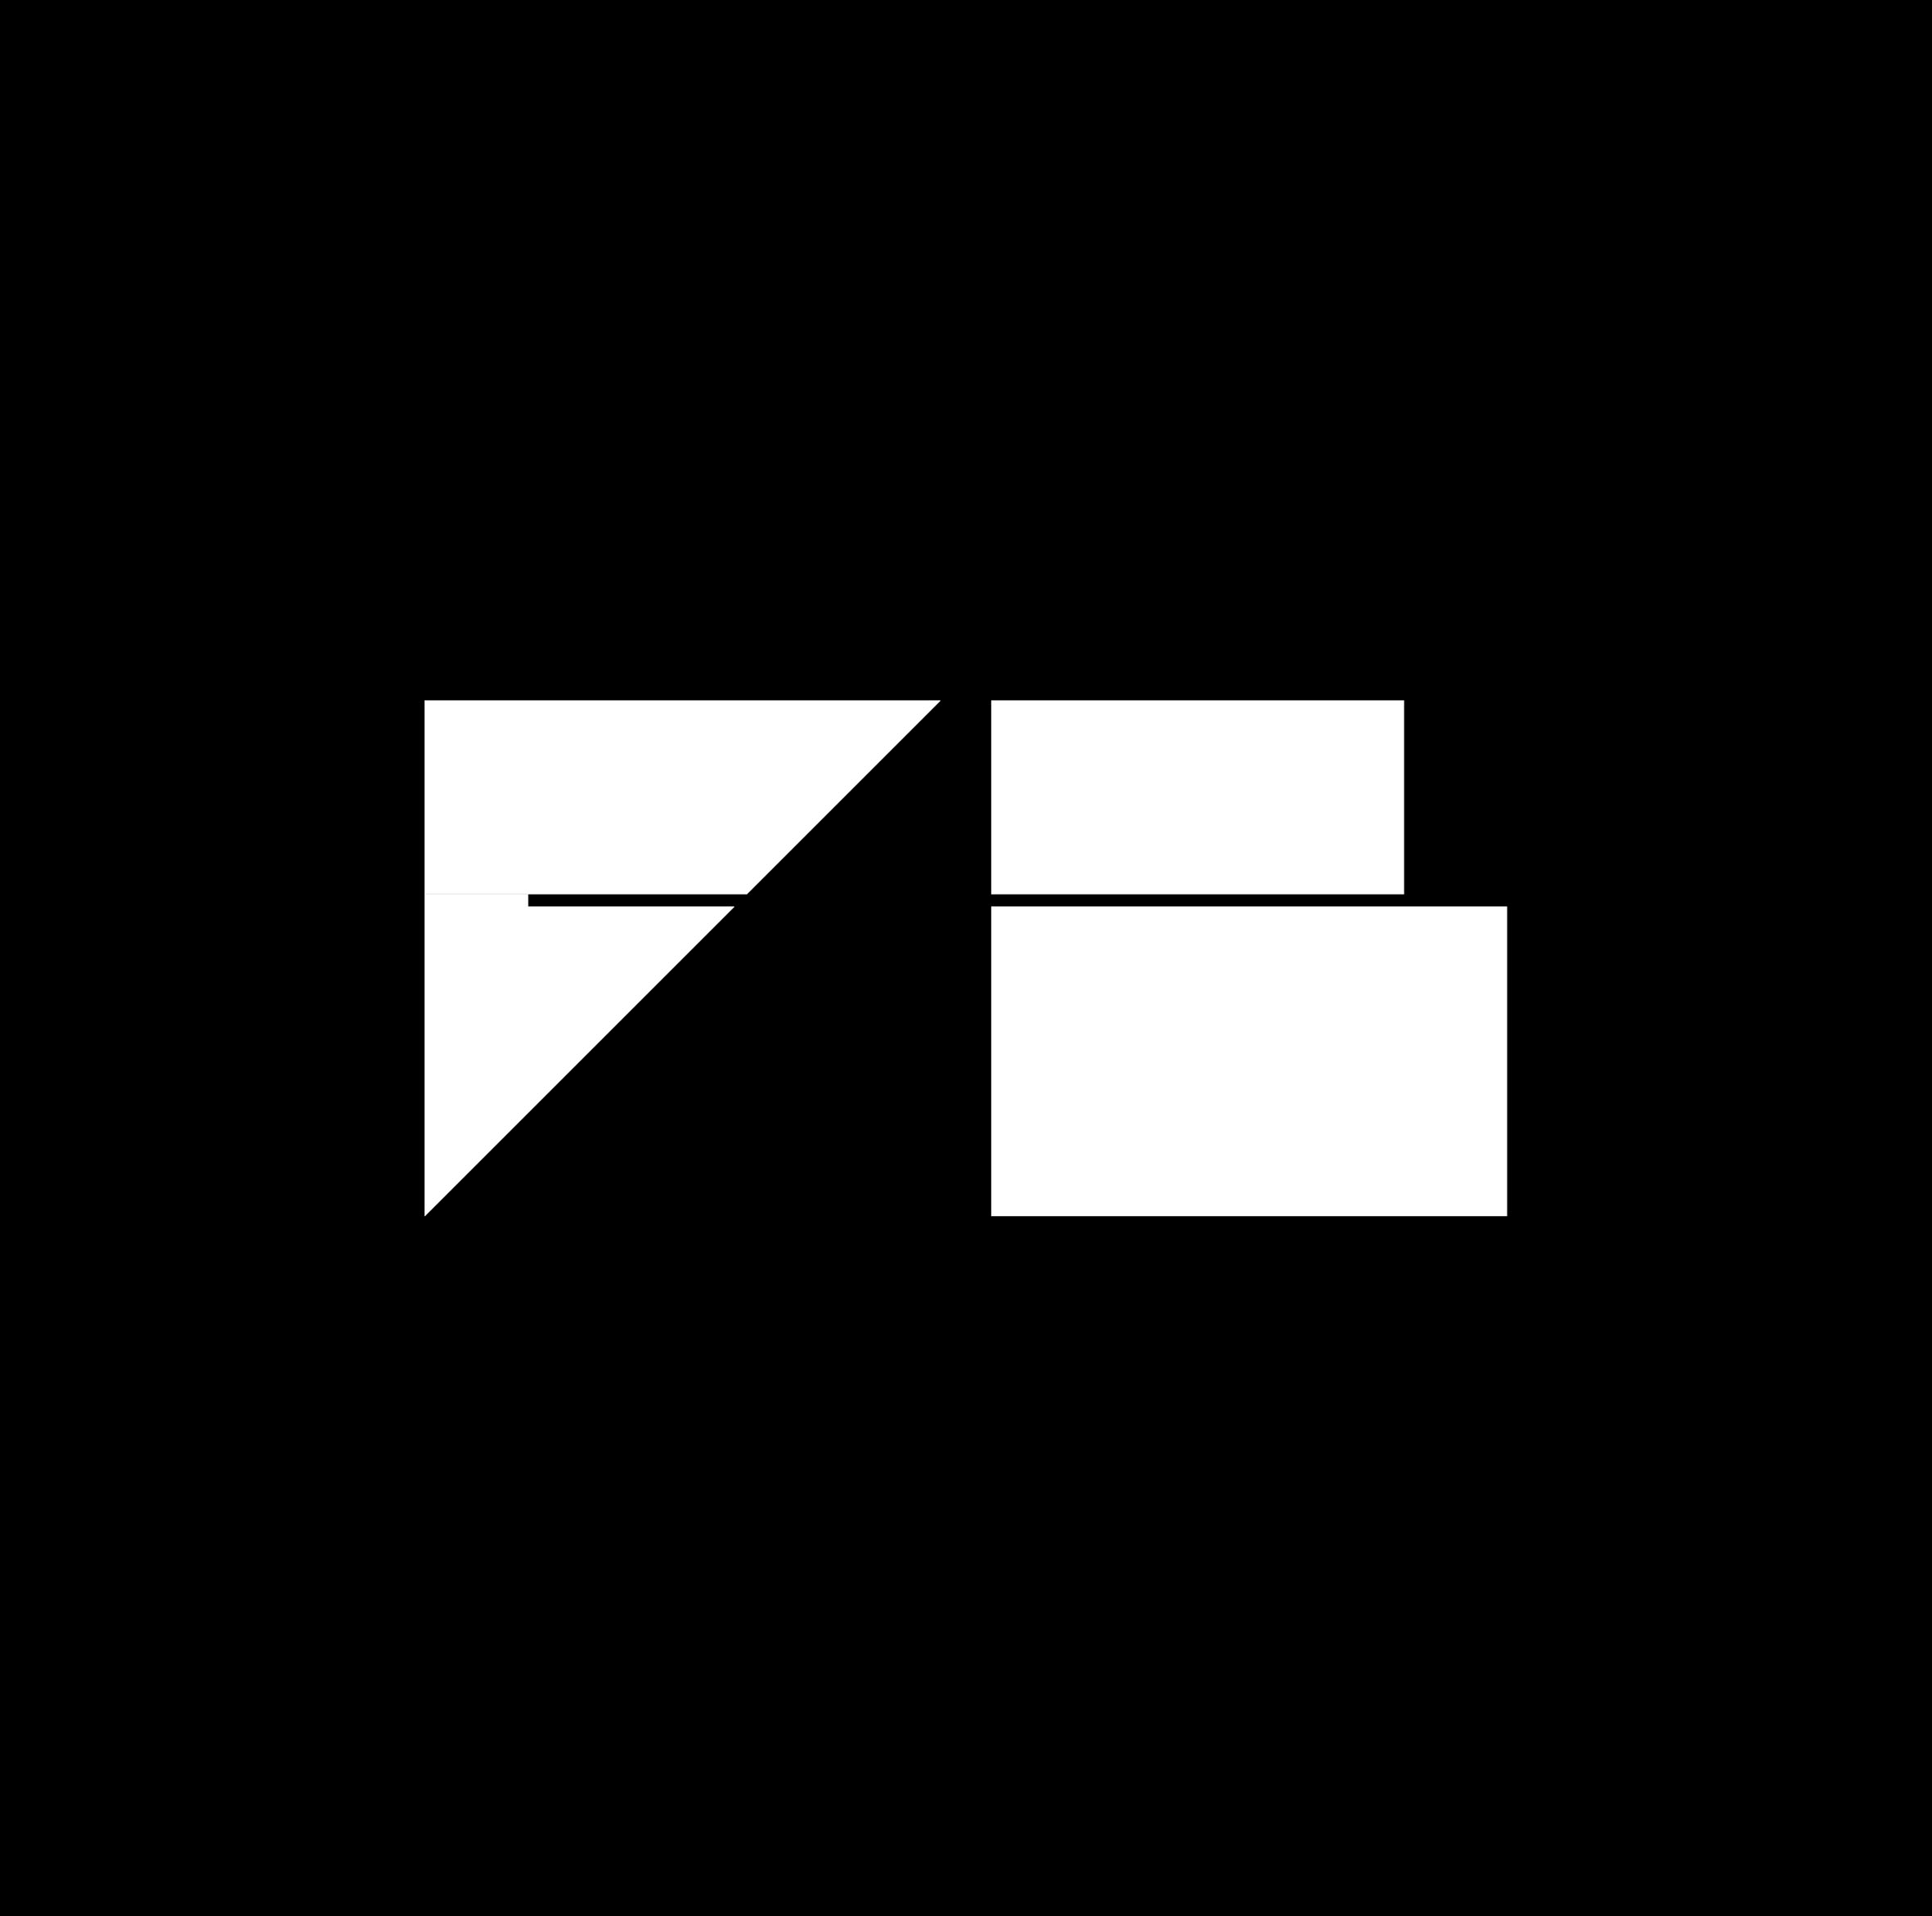 Logo fab i